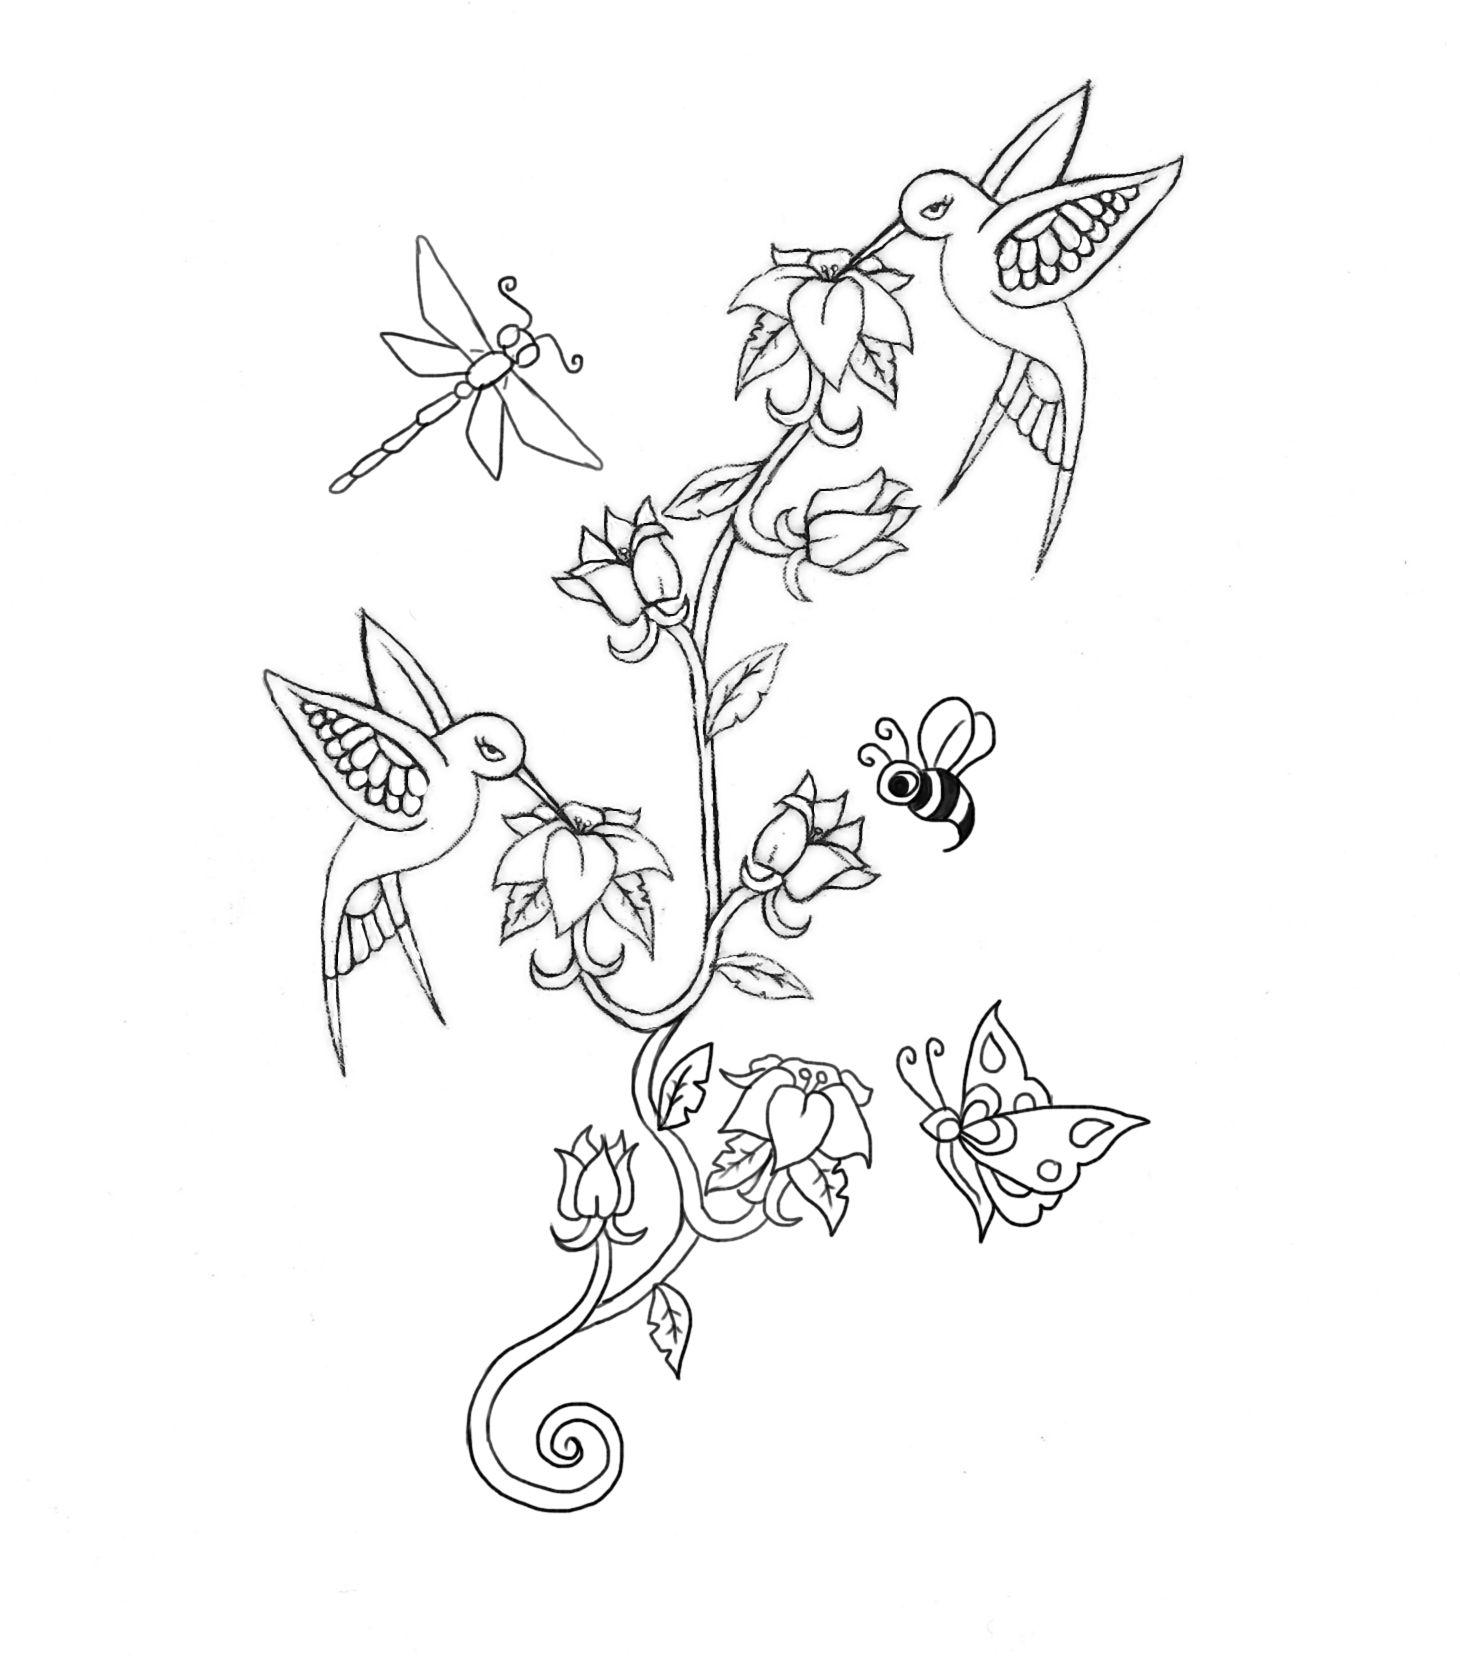 Simple Flower Outline Tattoo Tattoos Trends Gallery Flower Outline Tattoo Flower Outline Simple Flower Tattoo